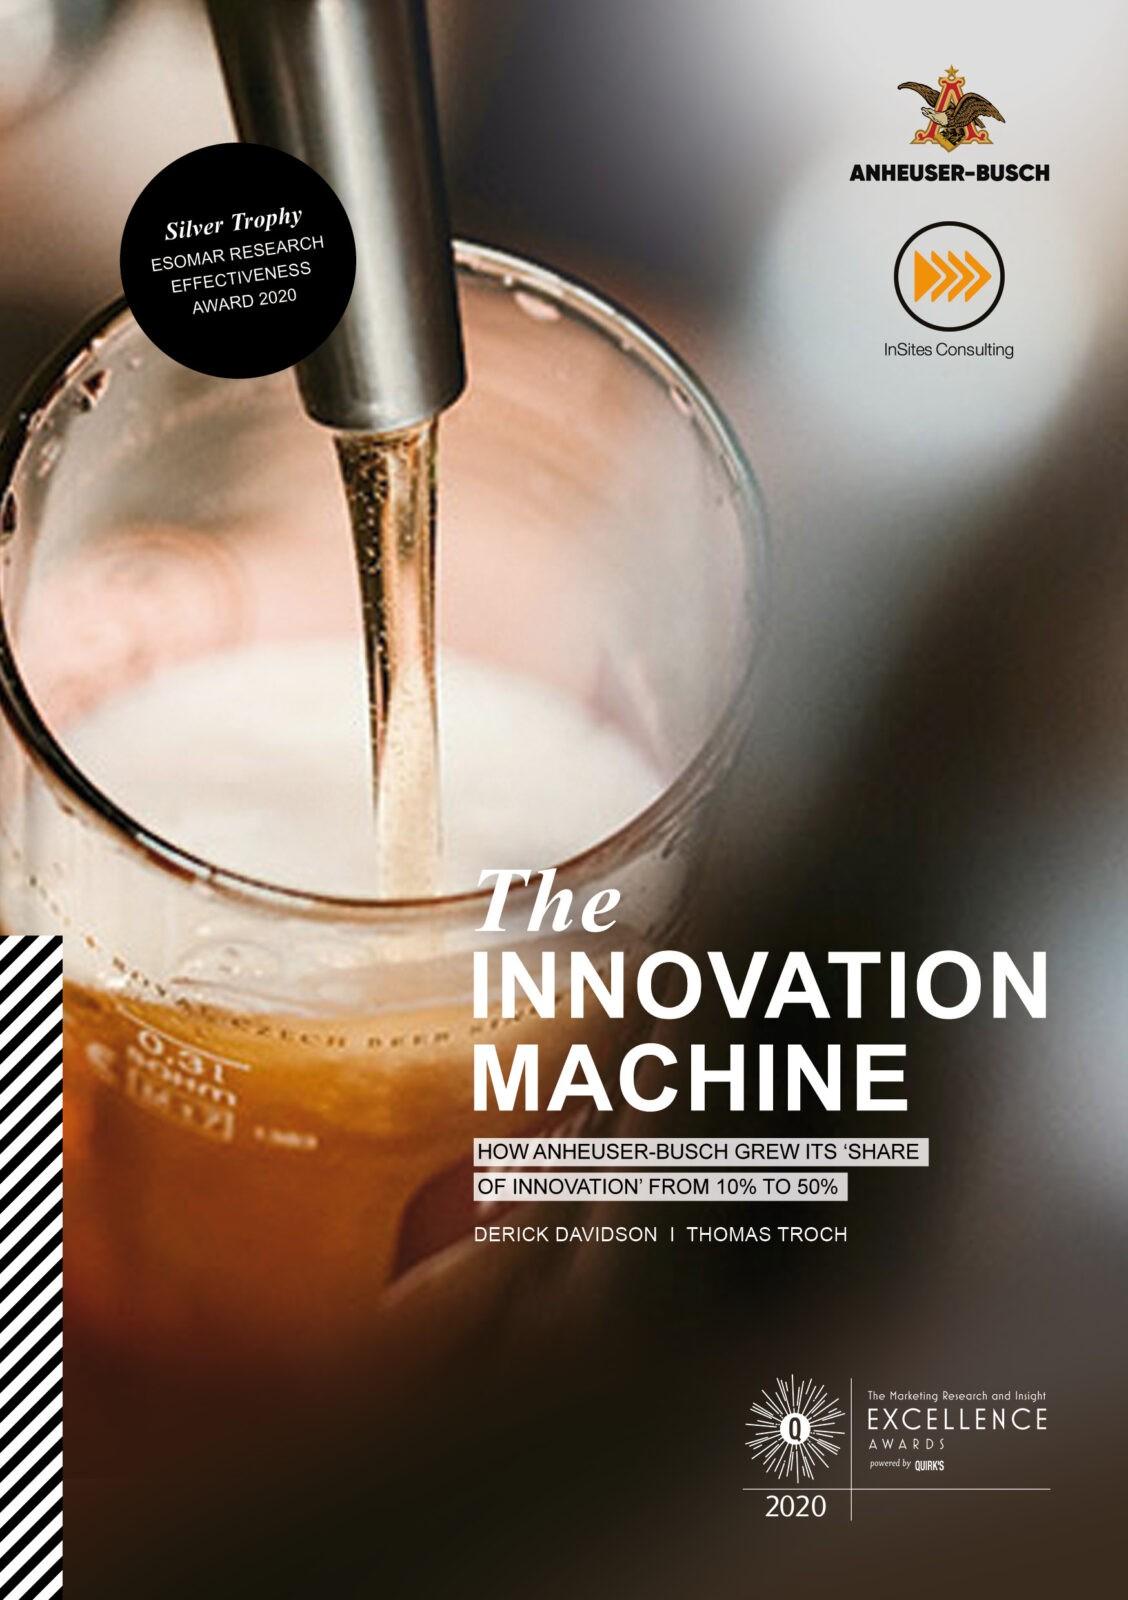 The Innovation Machine - an Anheuser-Busch case study